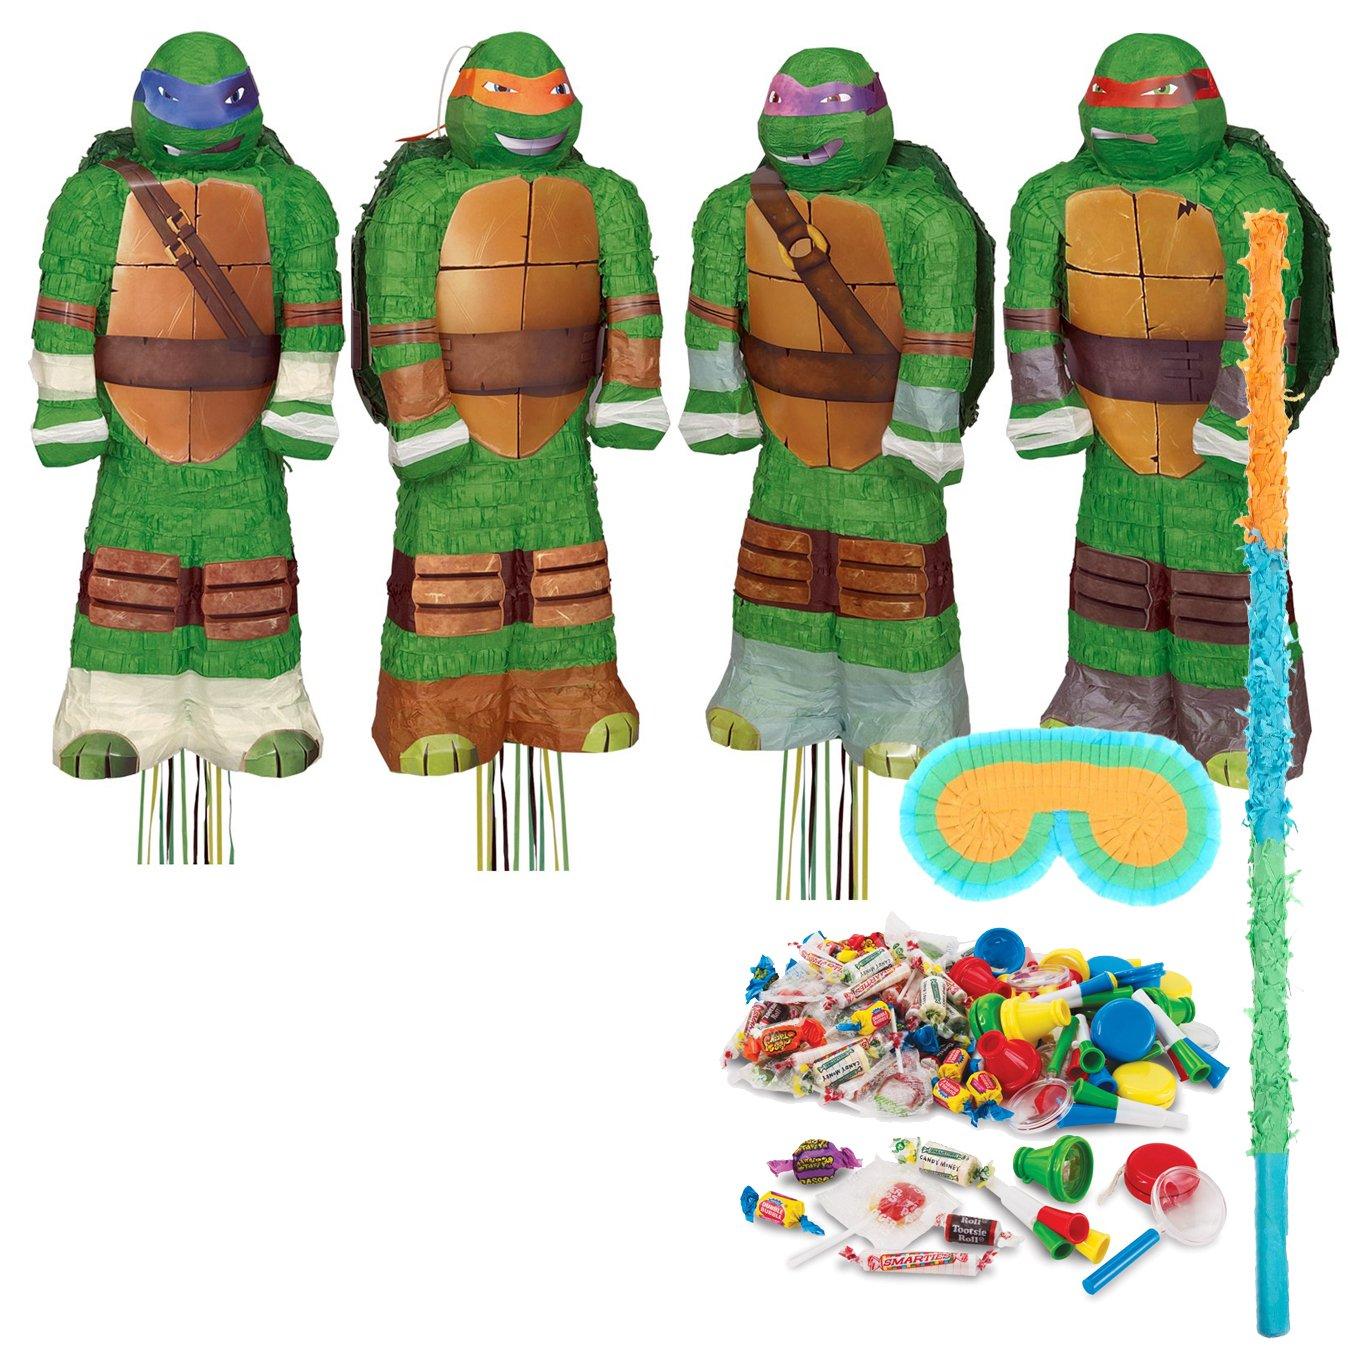 BirthdayExpress Teenage Mutant Ninja Turtles Party Supplies - Shaped Pinata Kit